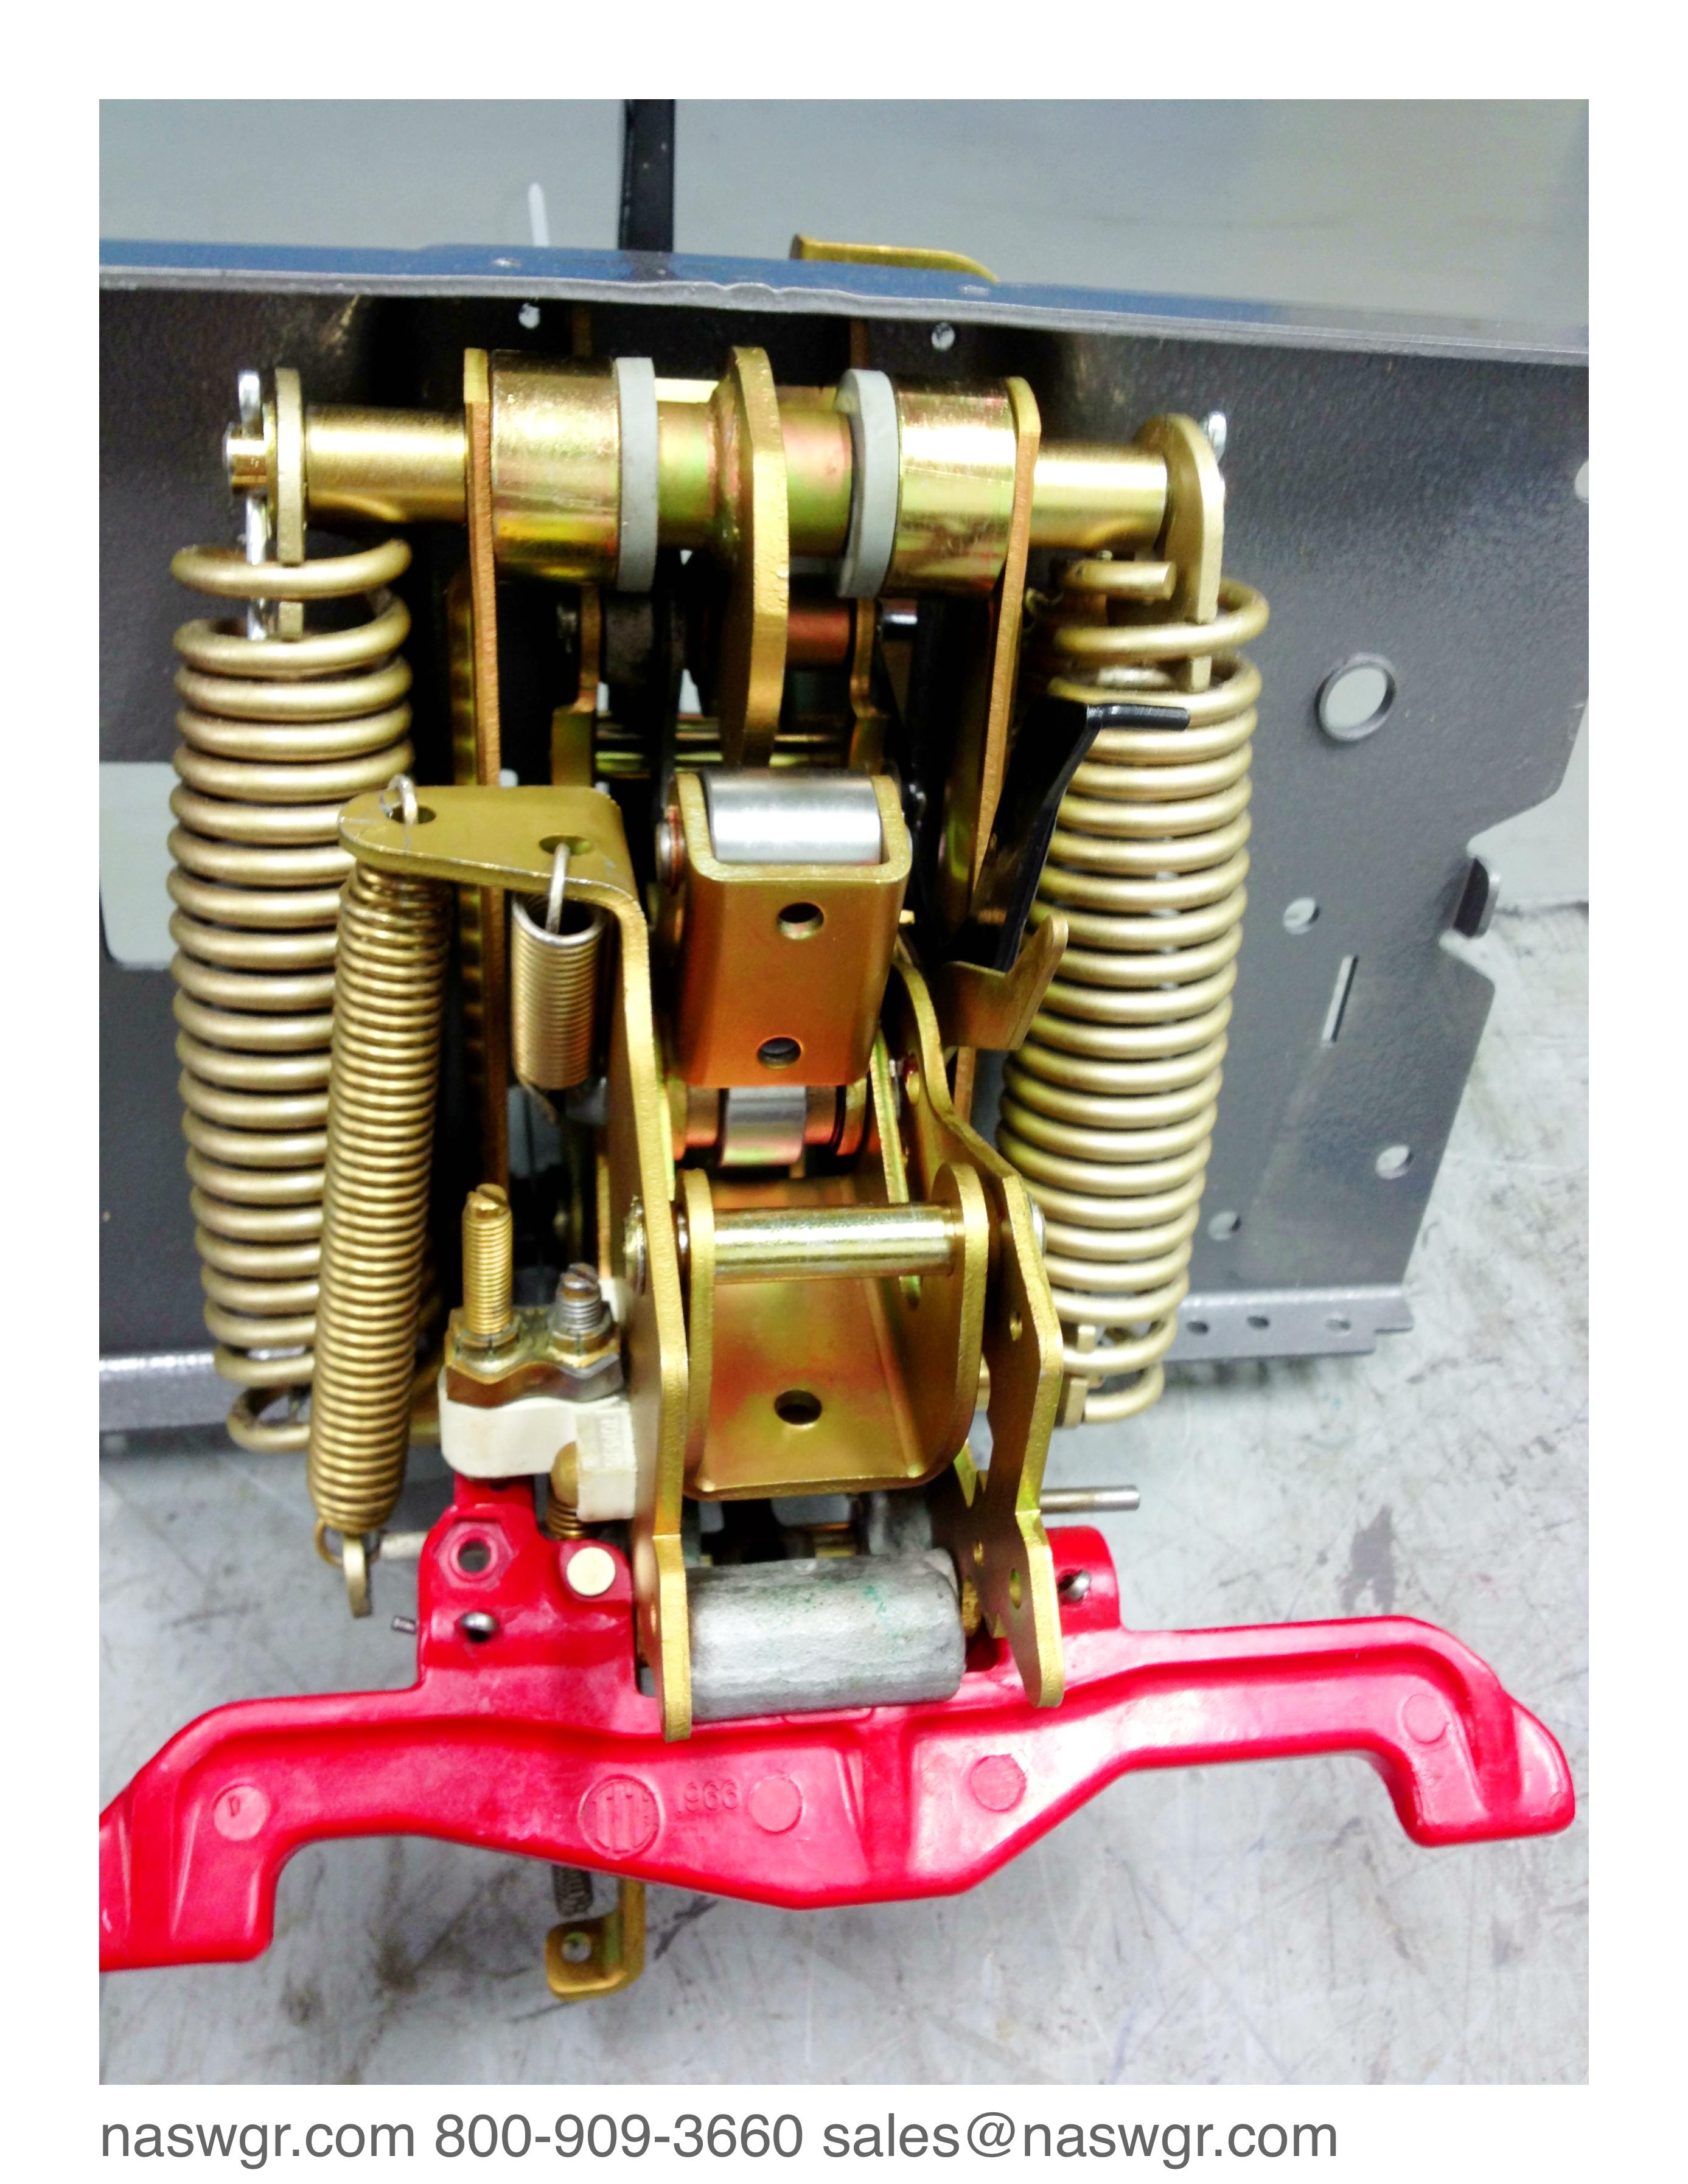 K 600 Ite K 600 Circuit Breaker Being Re Assembled